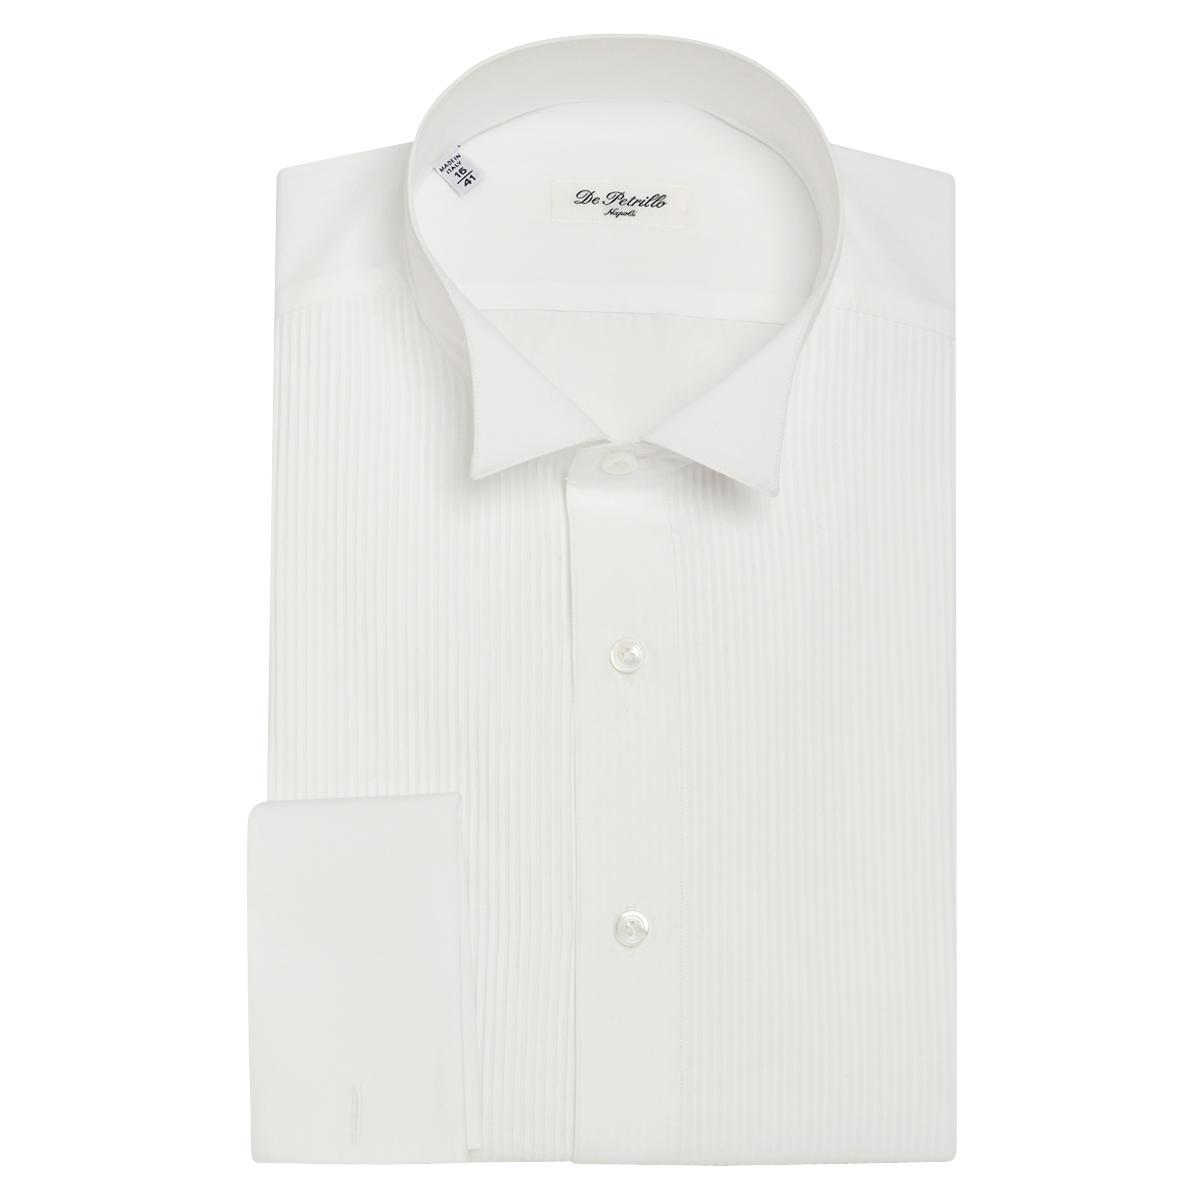 White Cotton Winged Collar Tuxedo Shirt